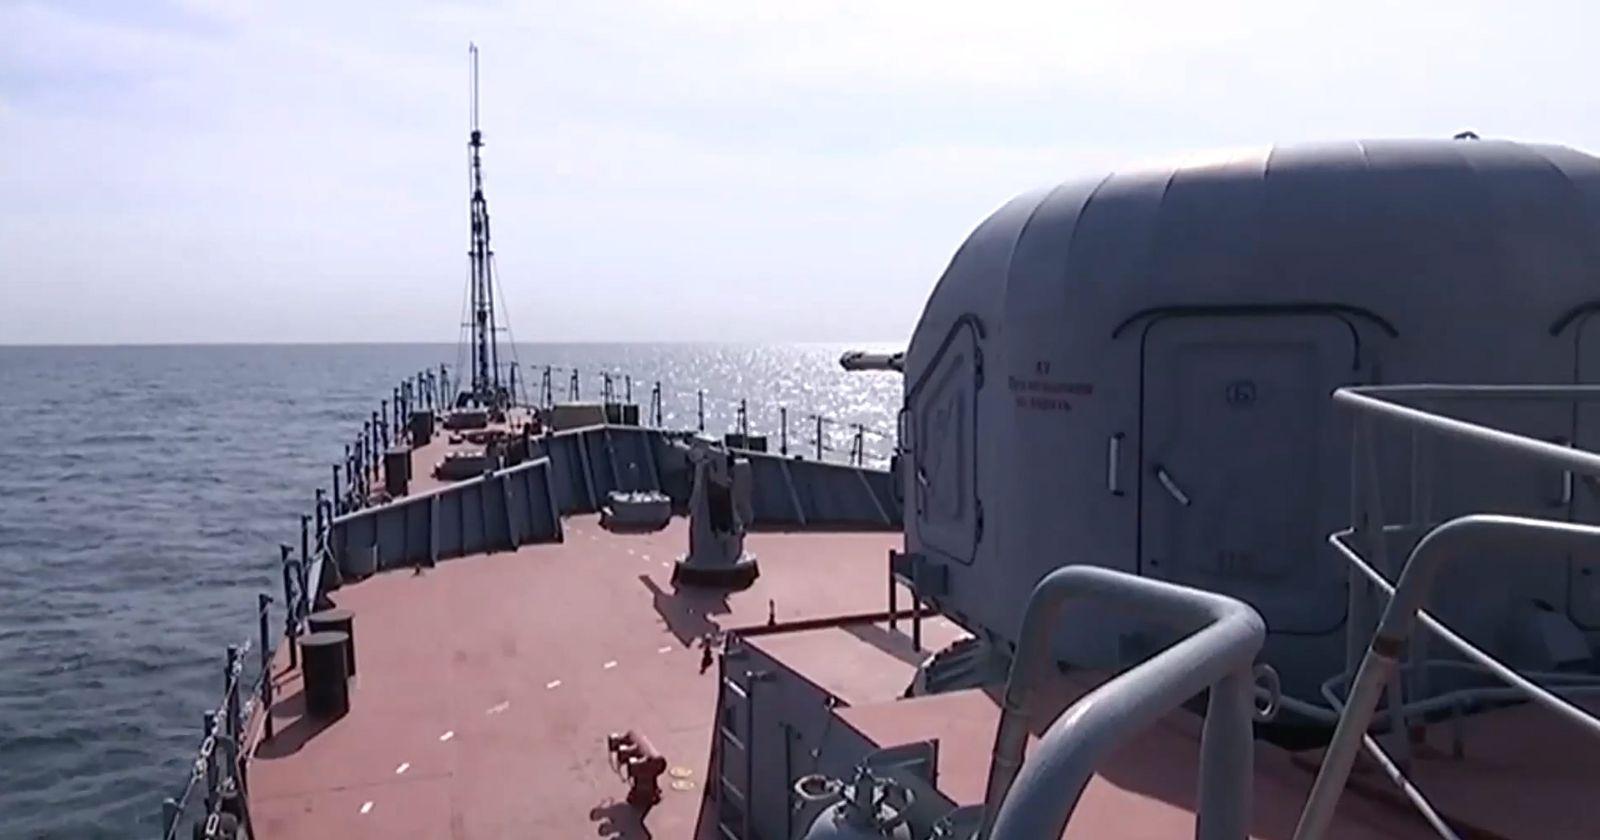 Russian Caspian sea-based cruise missiles strike in Syria